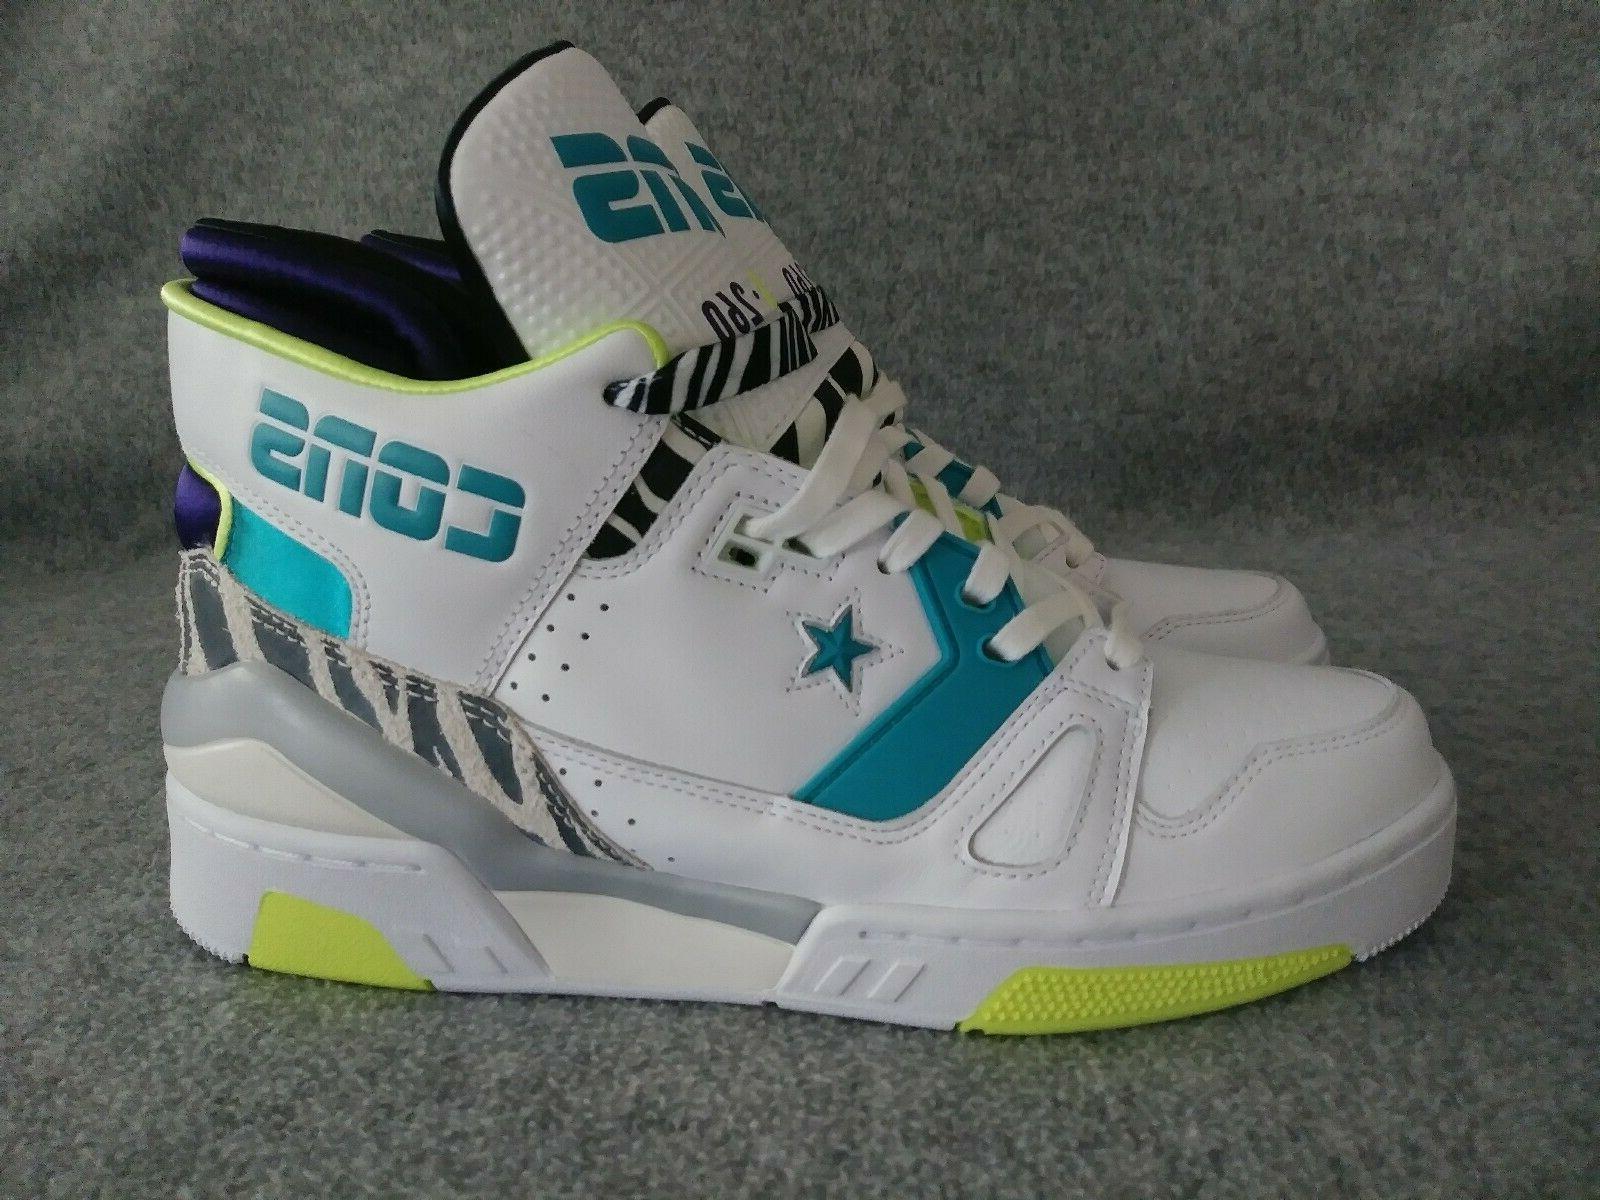 Converse Don 260 Top Basketball Shoes Sz 8 Sz 9.5